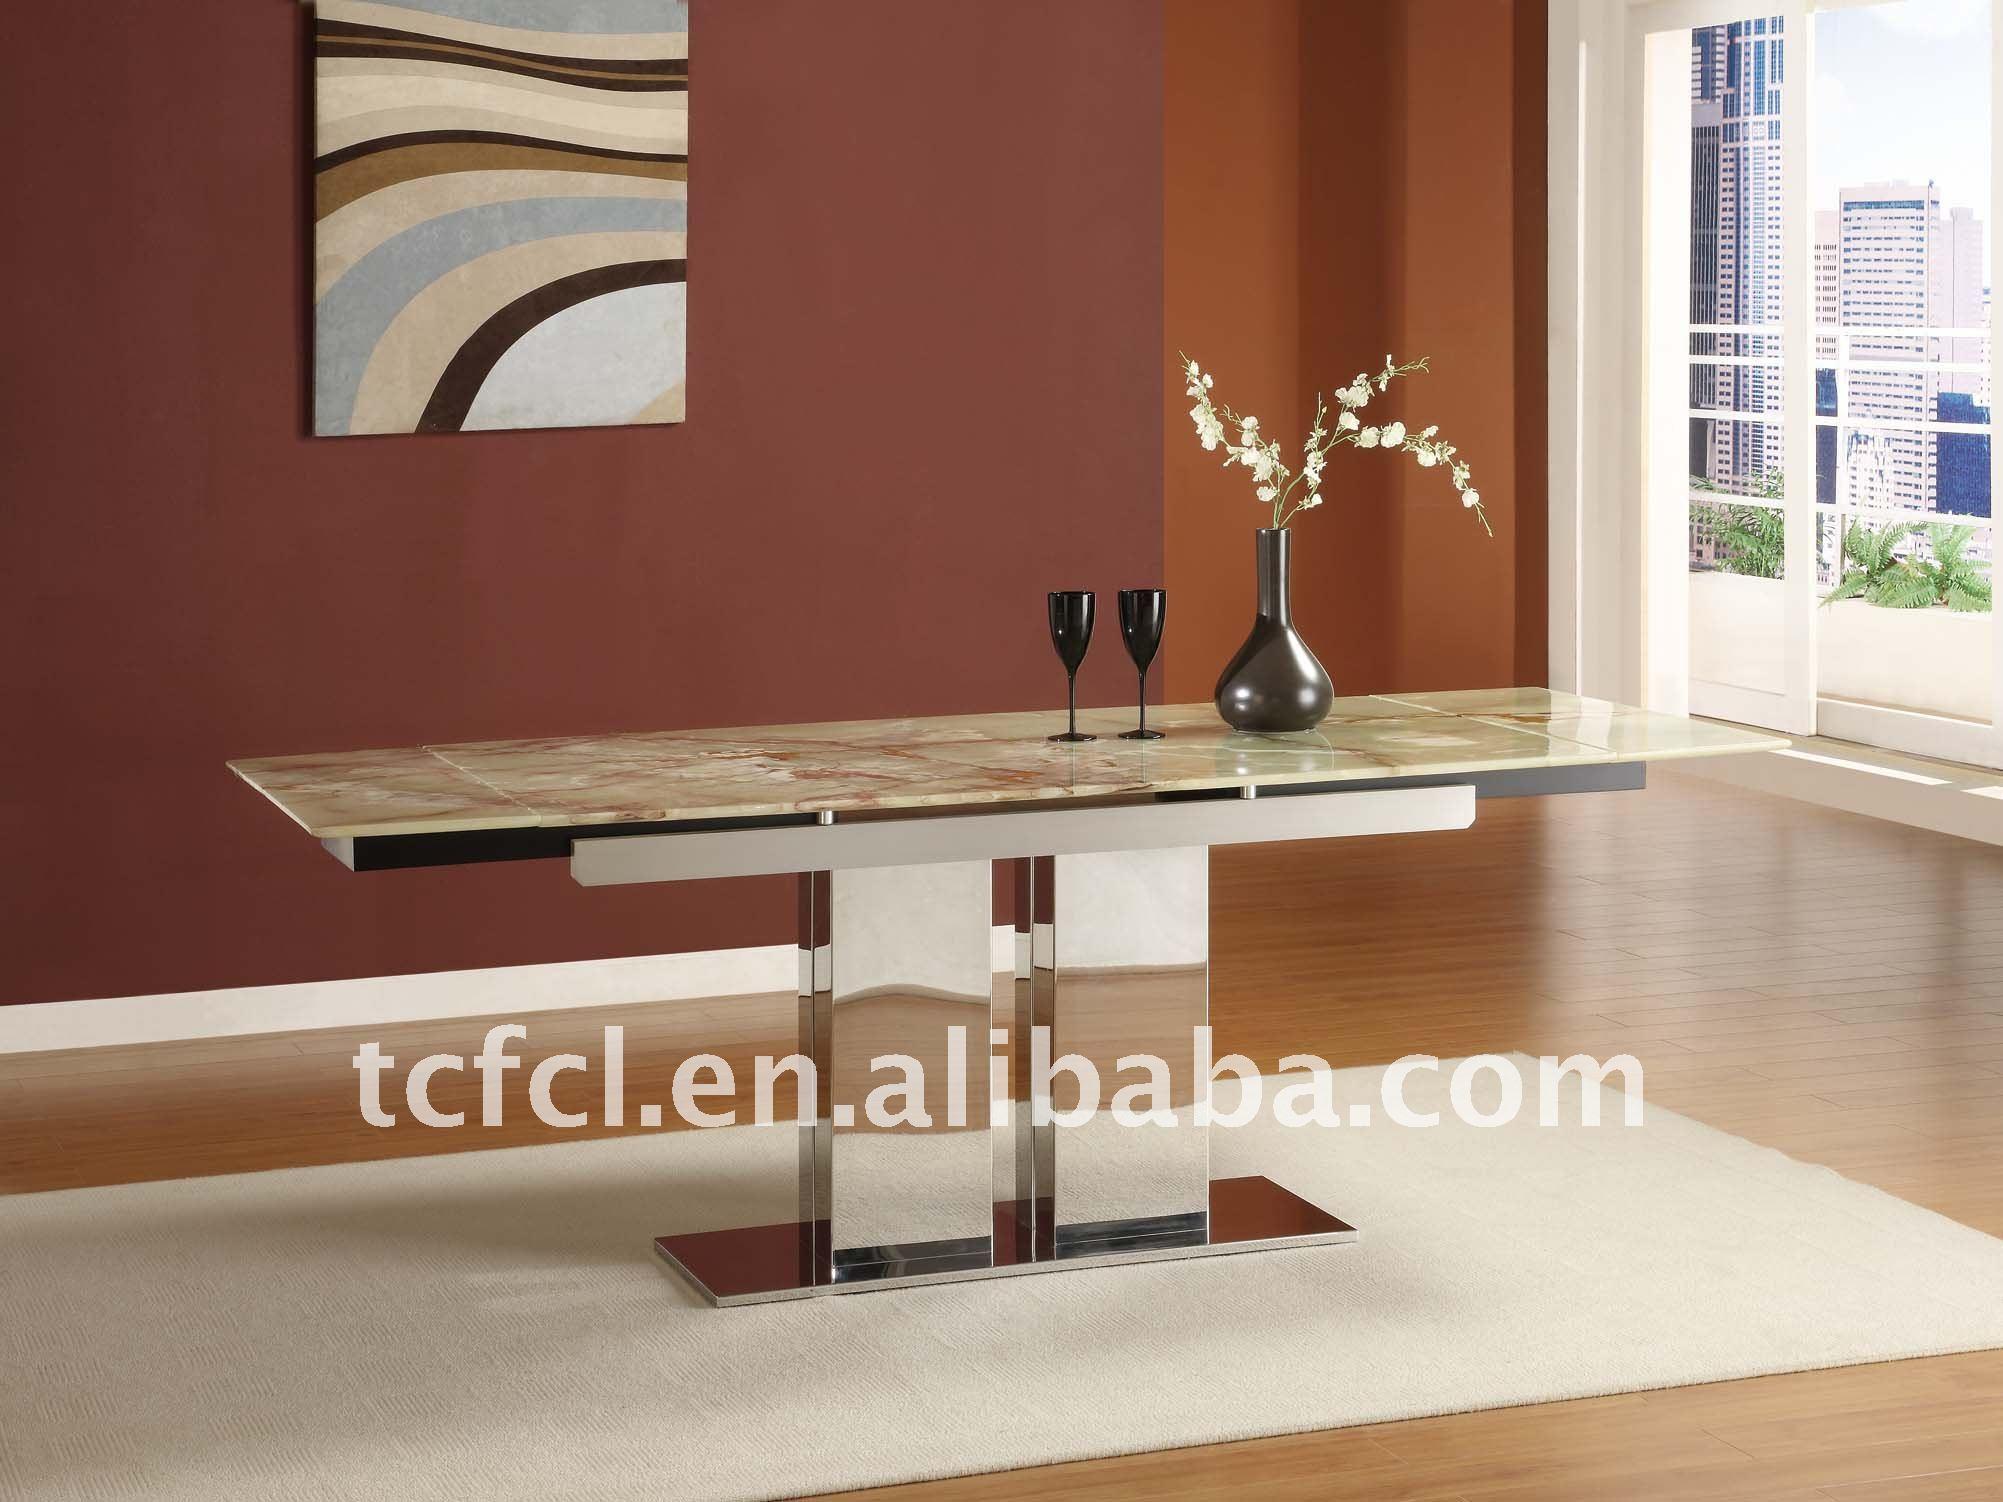 Mesa de comedor base marmol bs vkgss precio d bases de - Mesas de marmol precios ...